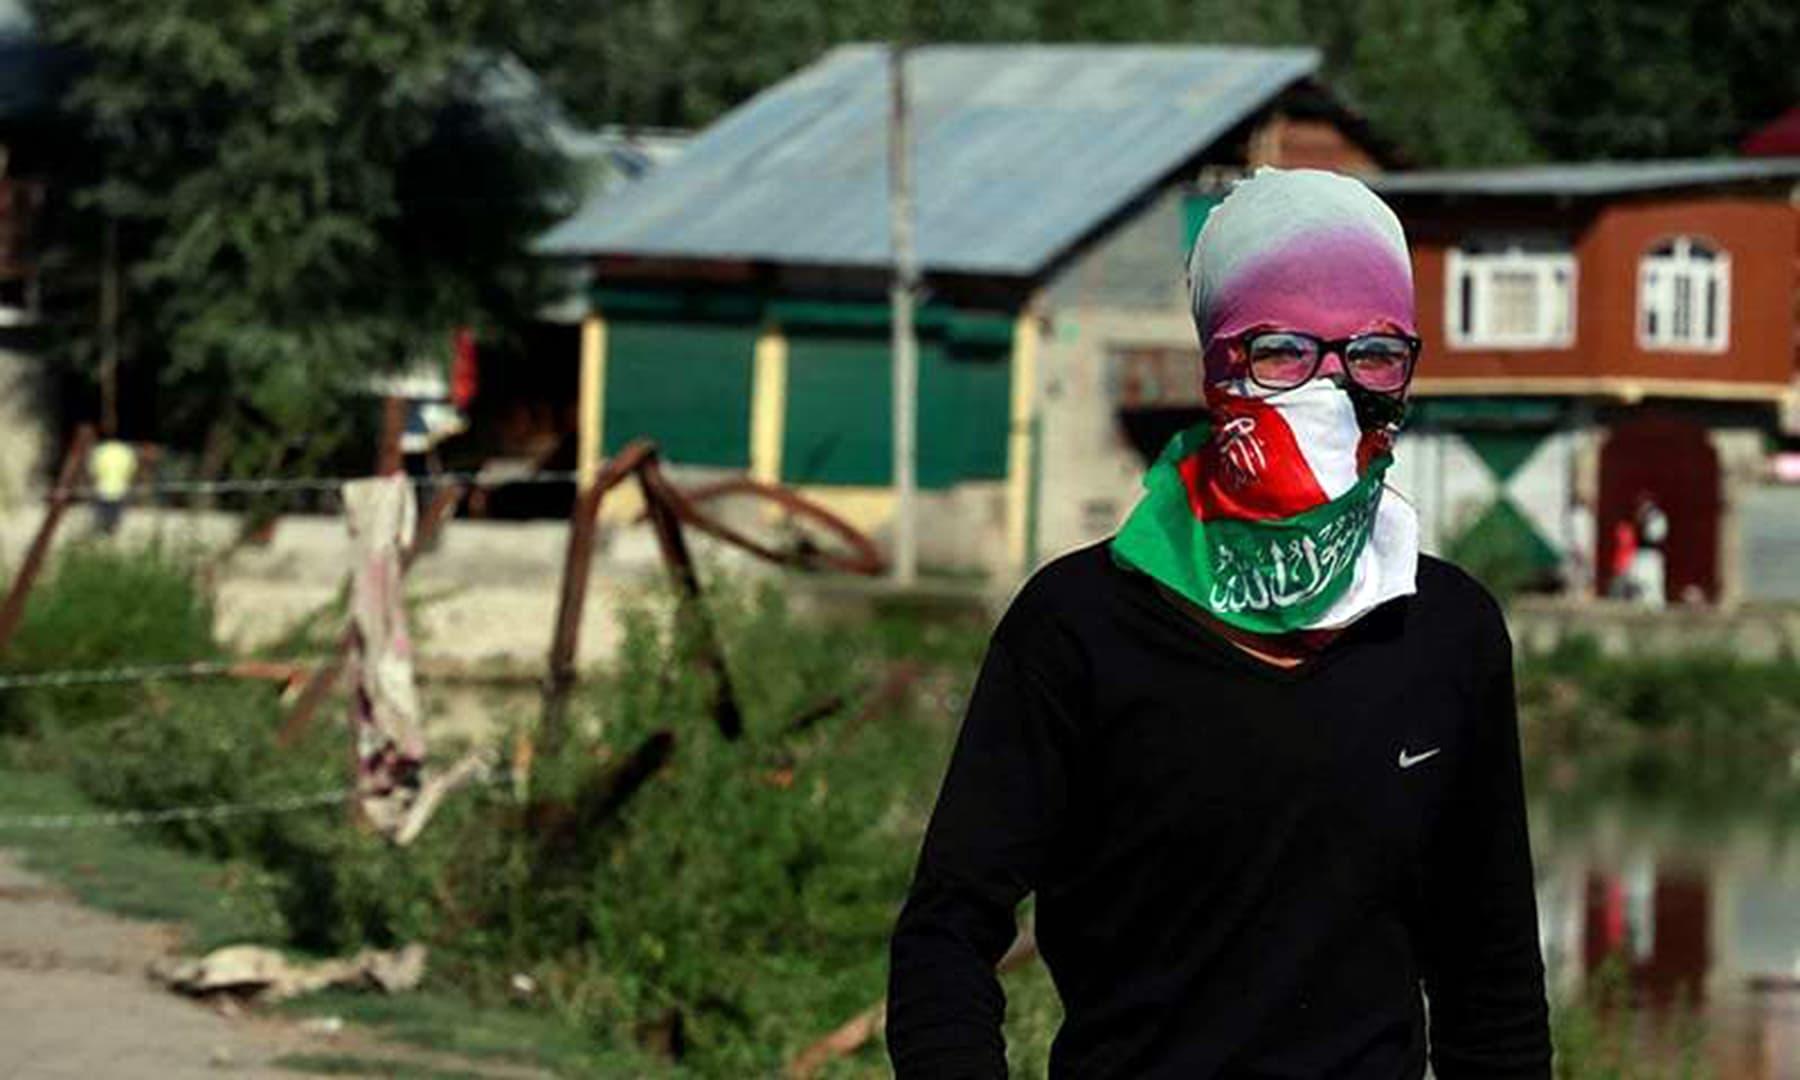 A Kashmiri masked protester stands near a barricade to block the entrance of a neighbourhood in Srinagar, August 19. — Reuters